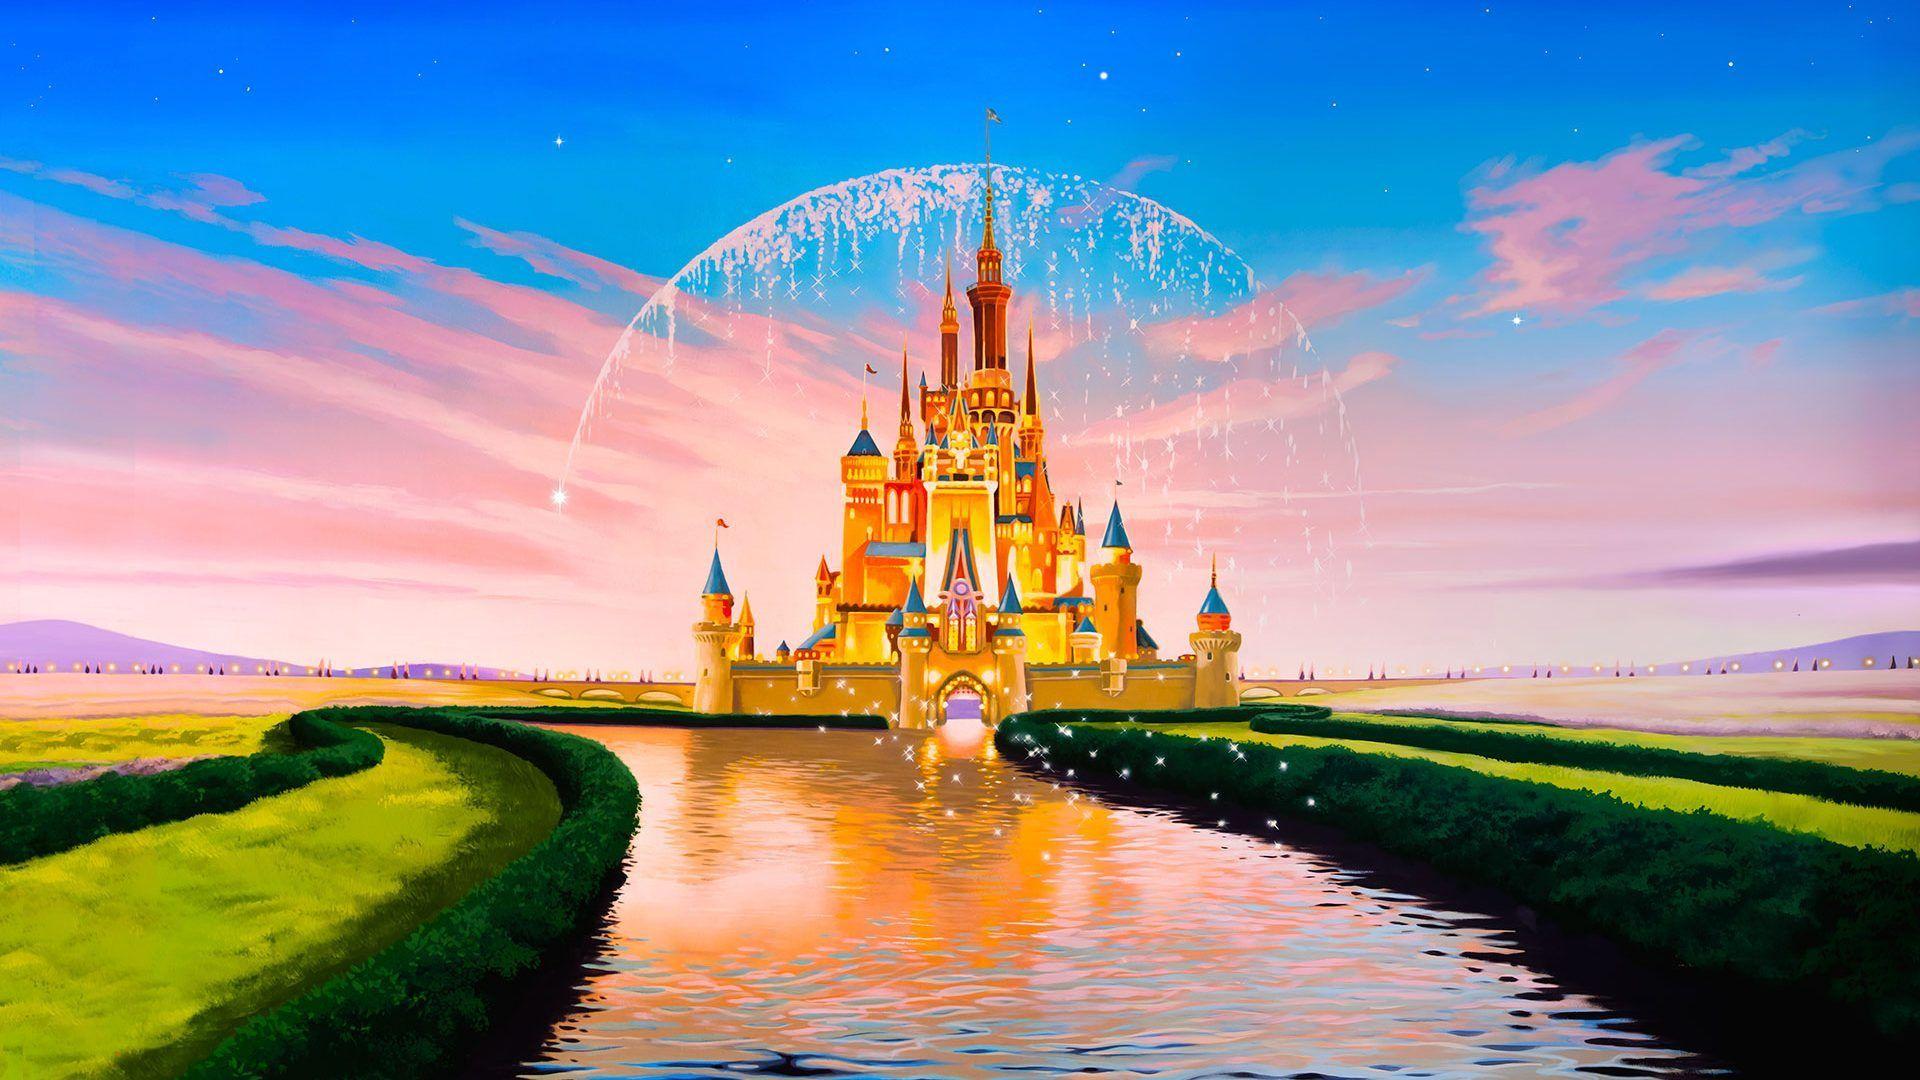 Disneyland Fond D Ecran Disney Fond D Ecran Hd Fond D Ecran Wallpaper Achtergronden Wallpaper Achtergronden